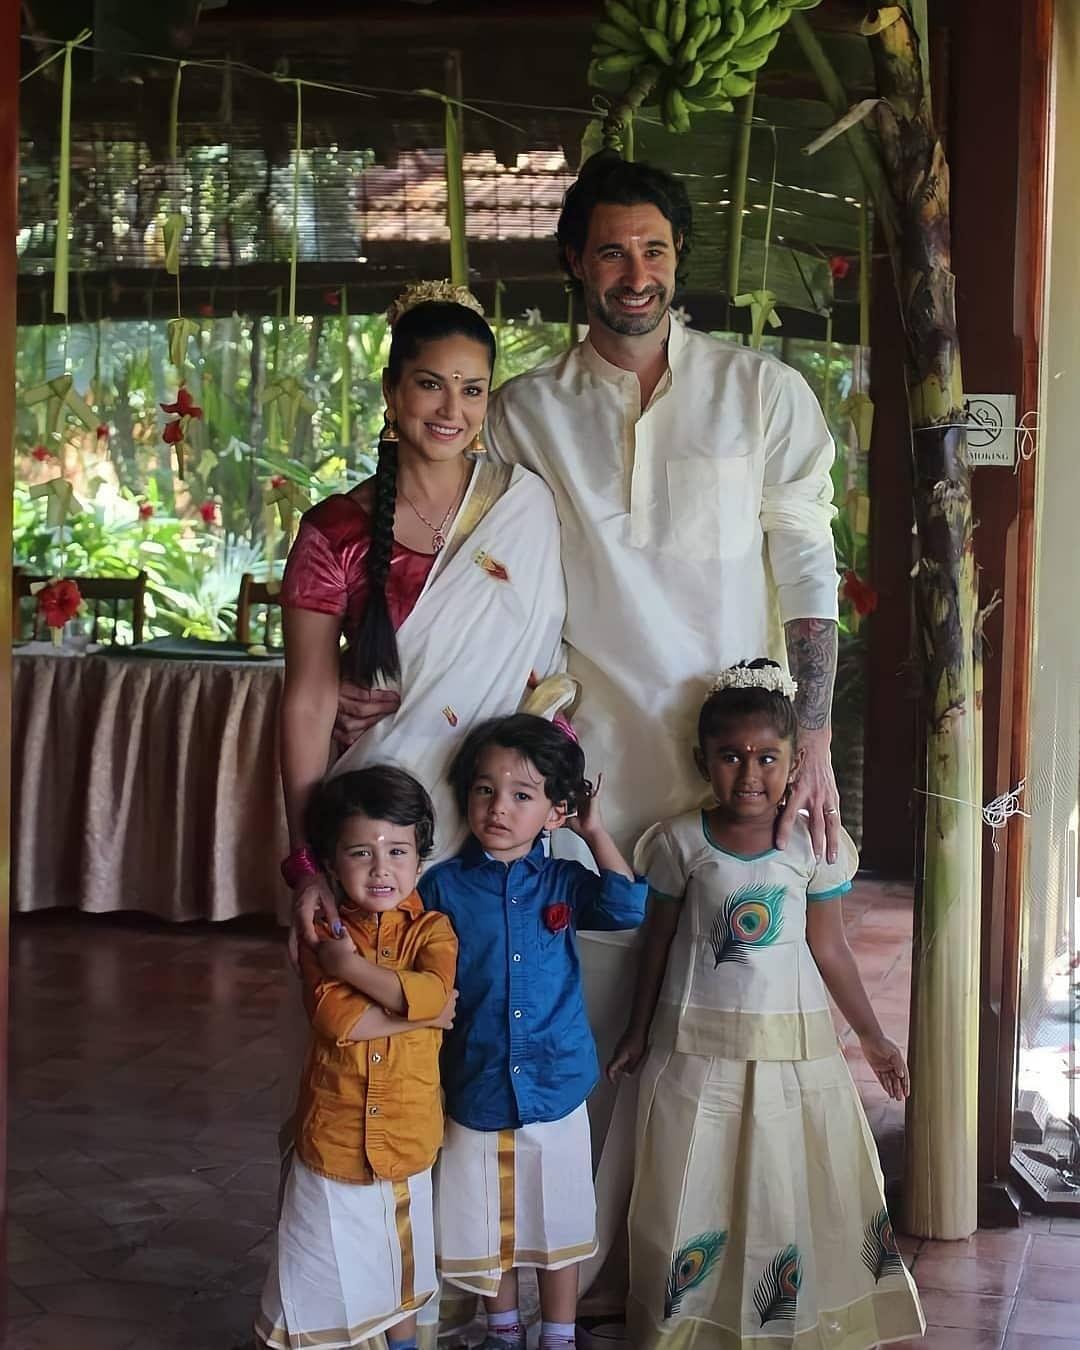 Sunny with husband, Daniel, and children, Nisha, Noah and Asher